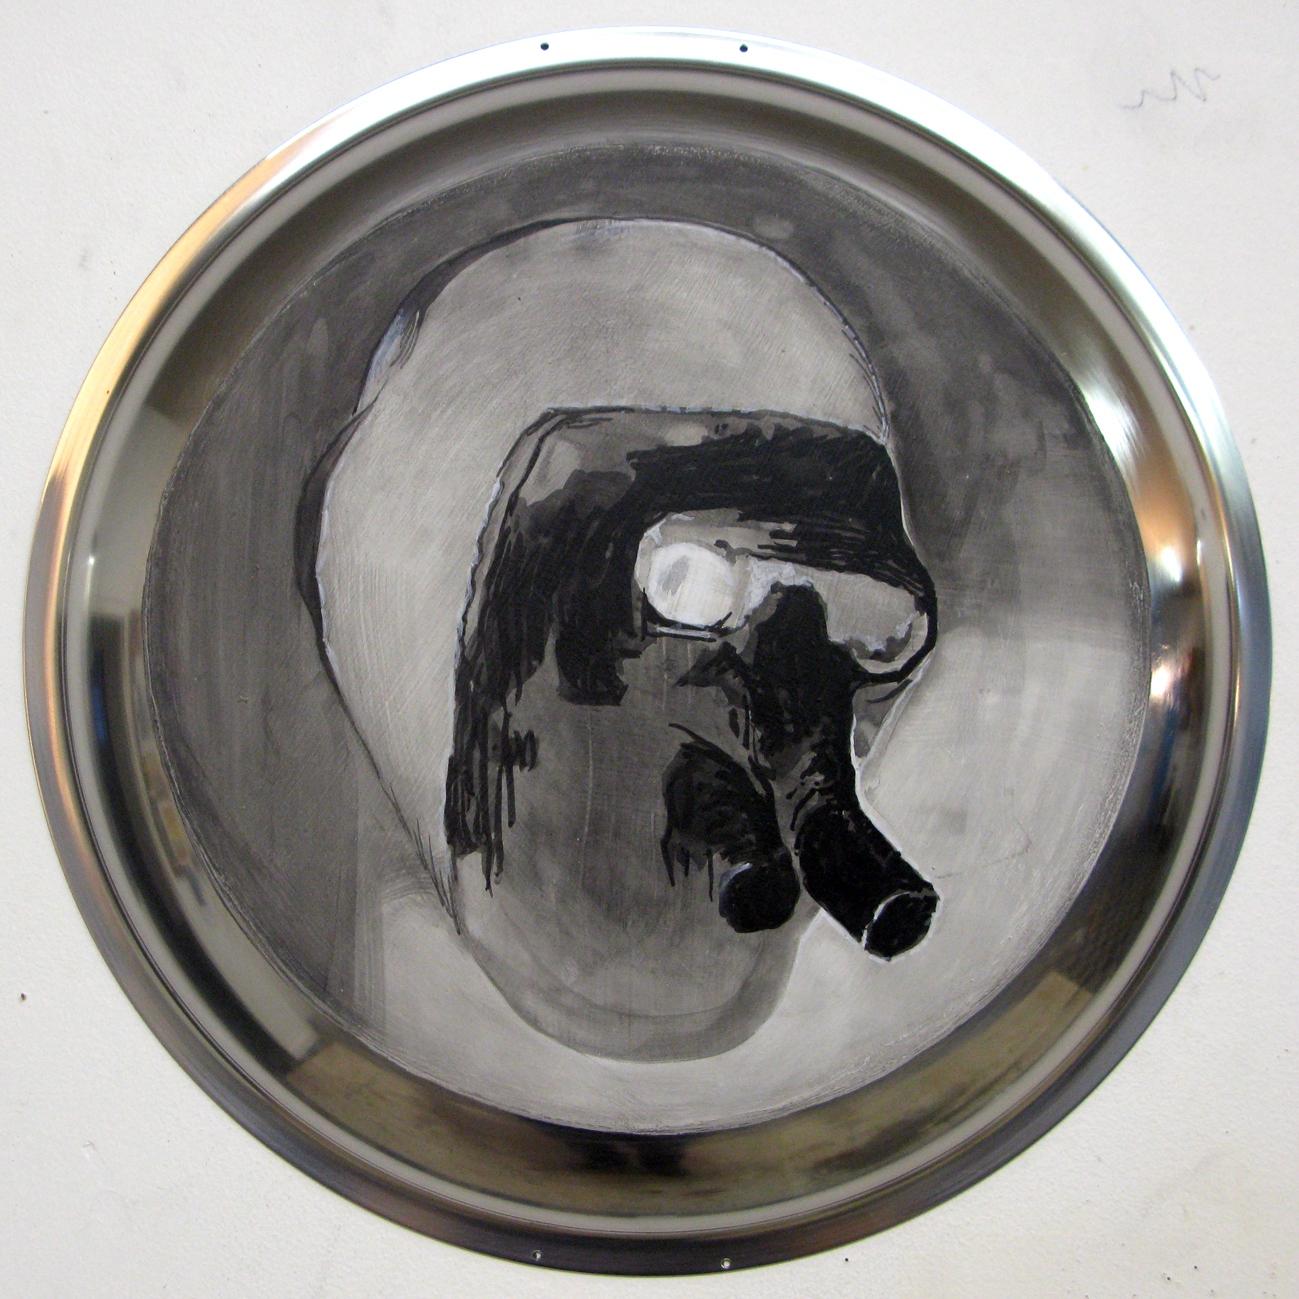 ADAM NORTON  Alien Head 2 2010 acrylic on steel 33 ×33 cm